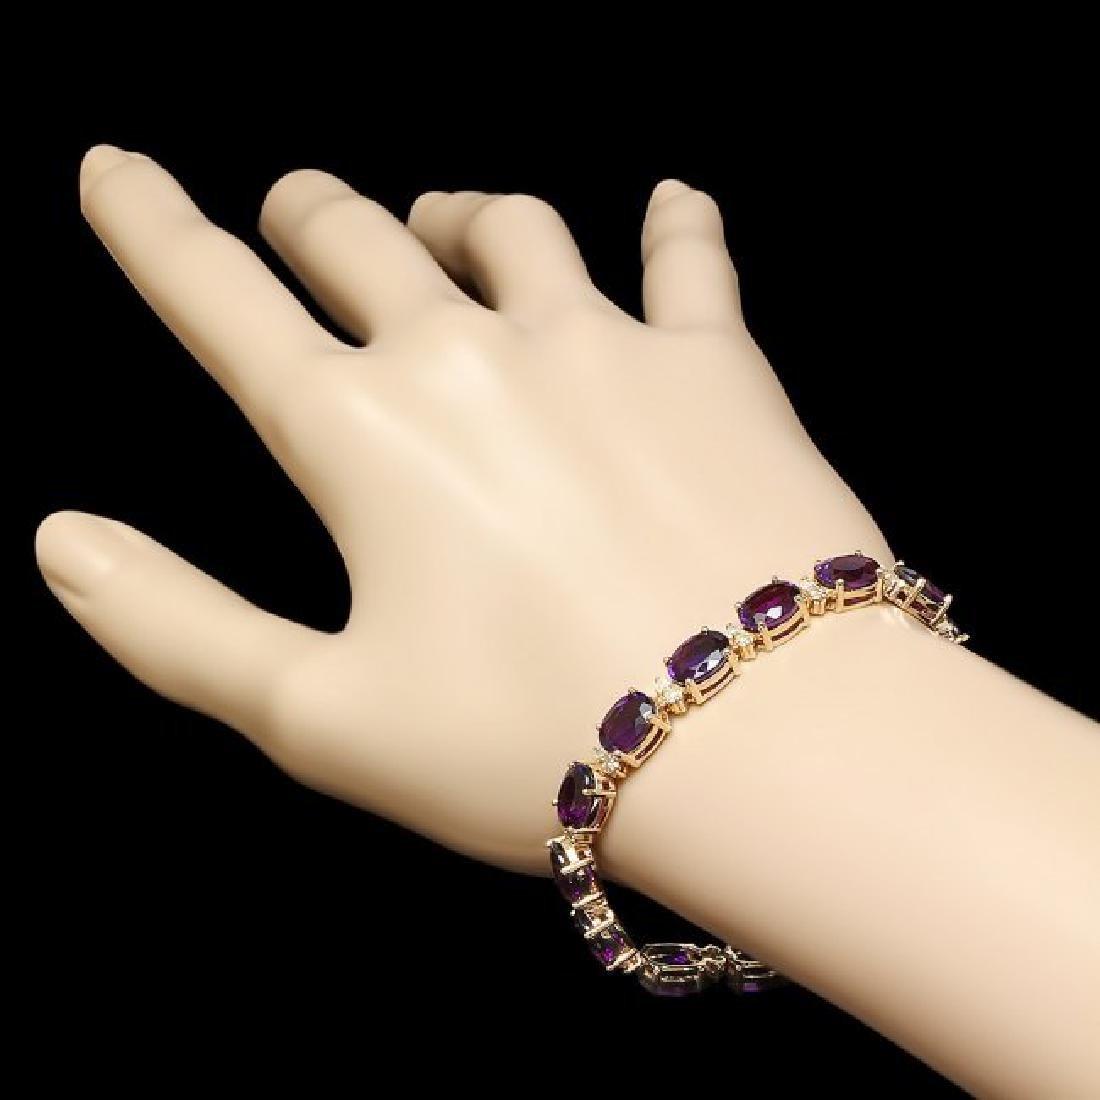 14k Gold 29.00ct Amethyst 1.30ct Diamond Bracelet - 5